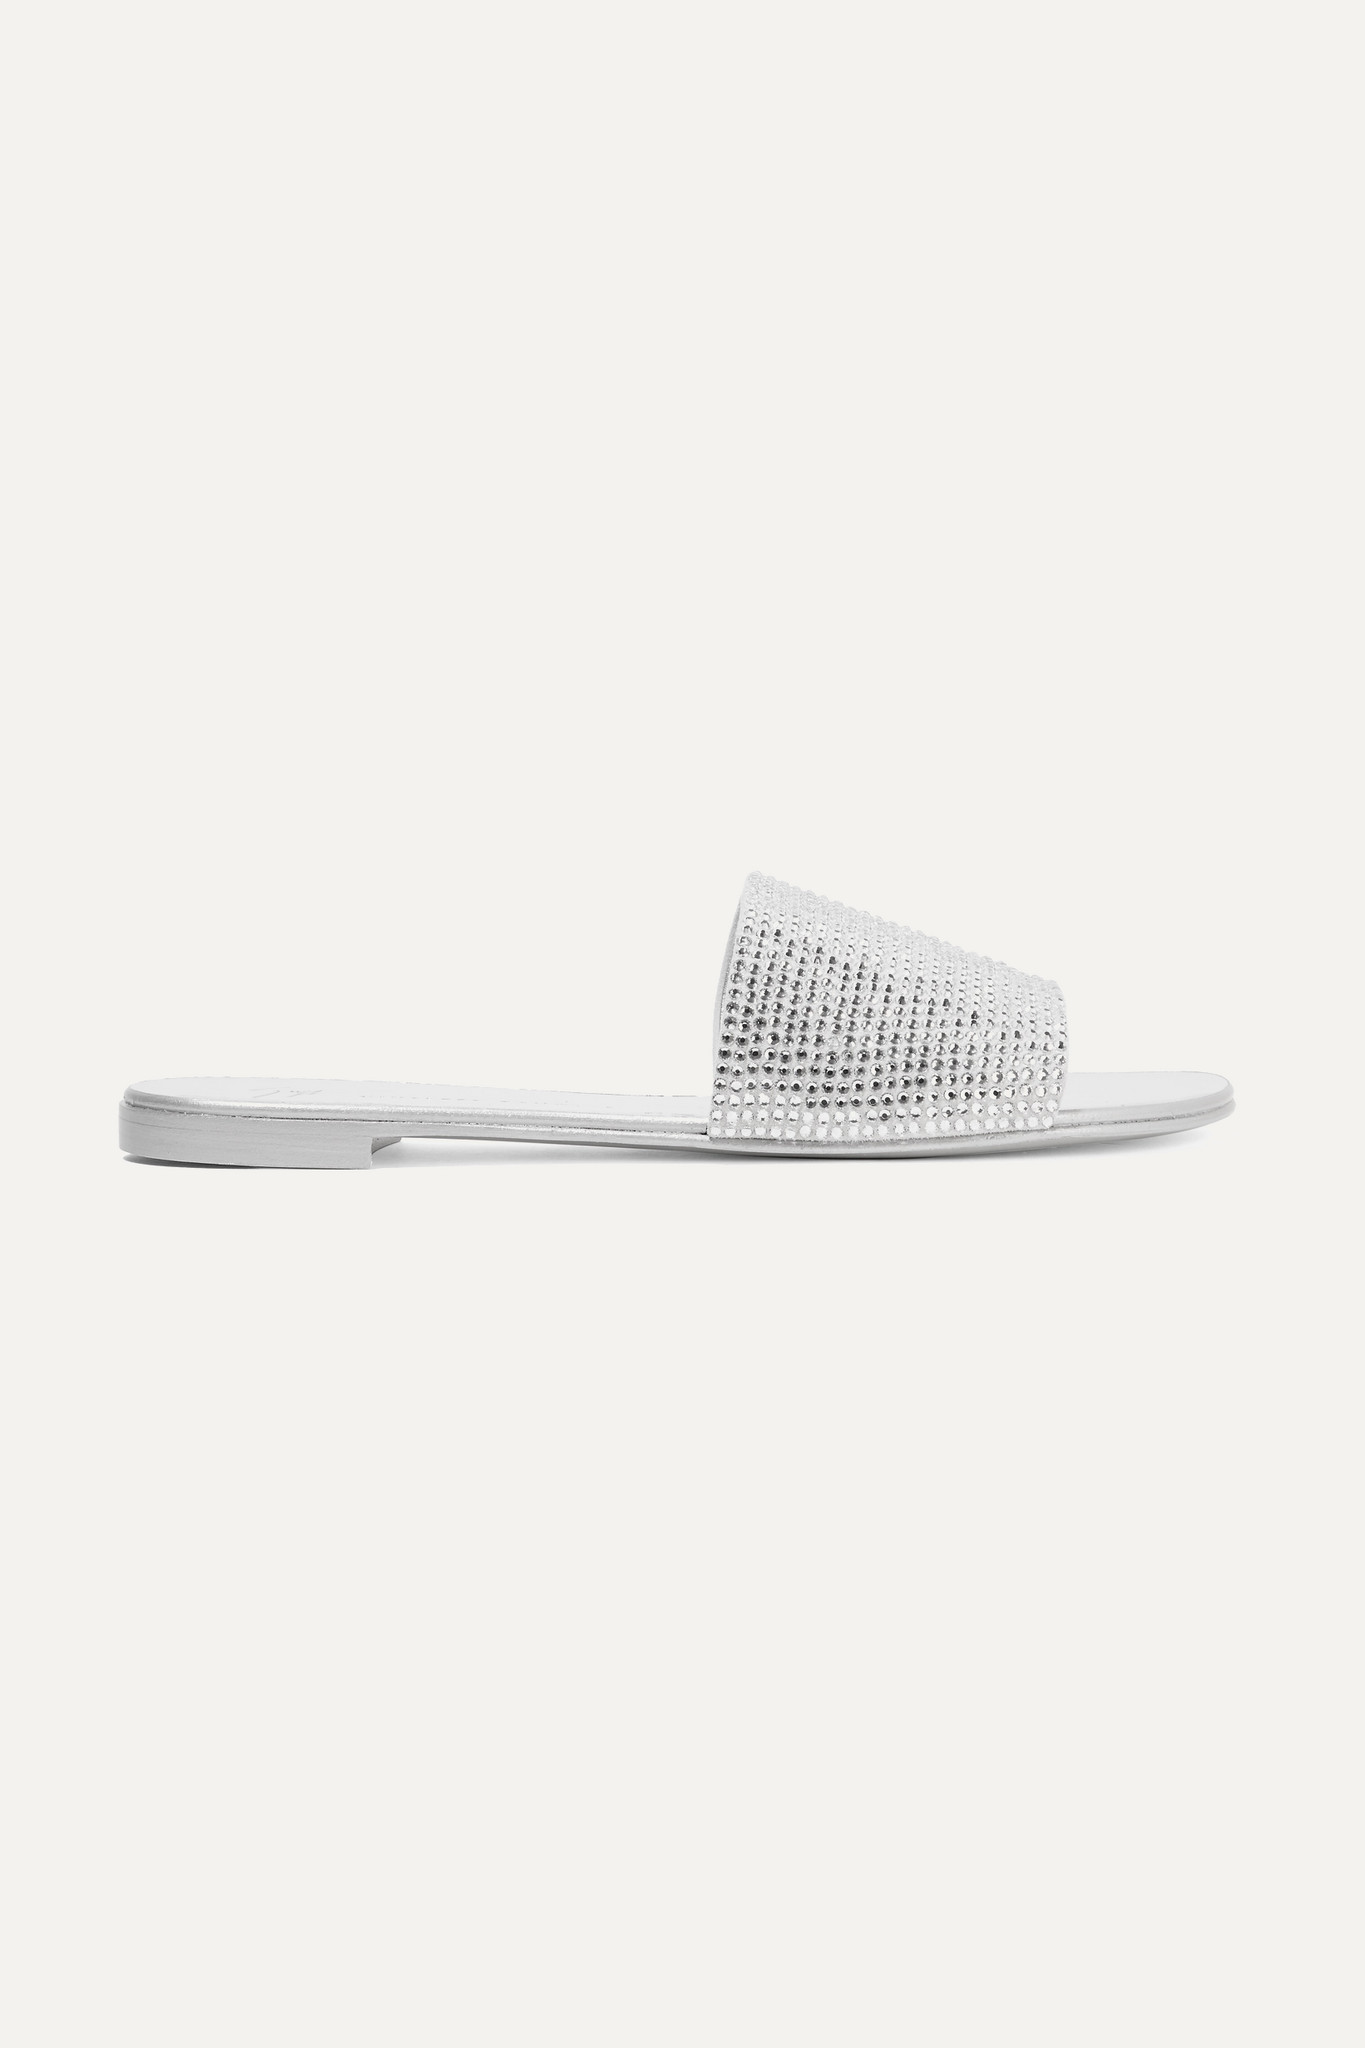 GIUSEPPE ZANOTTI - Adelia 水晶缀饰绒面革拖鞋 - 银色 - IT35.5